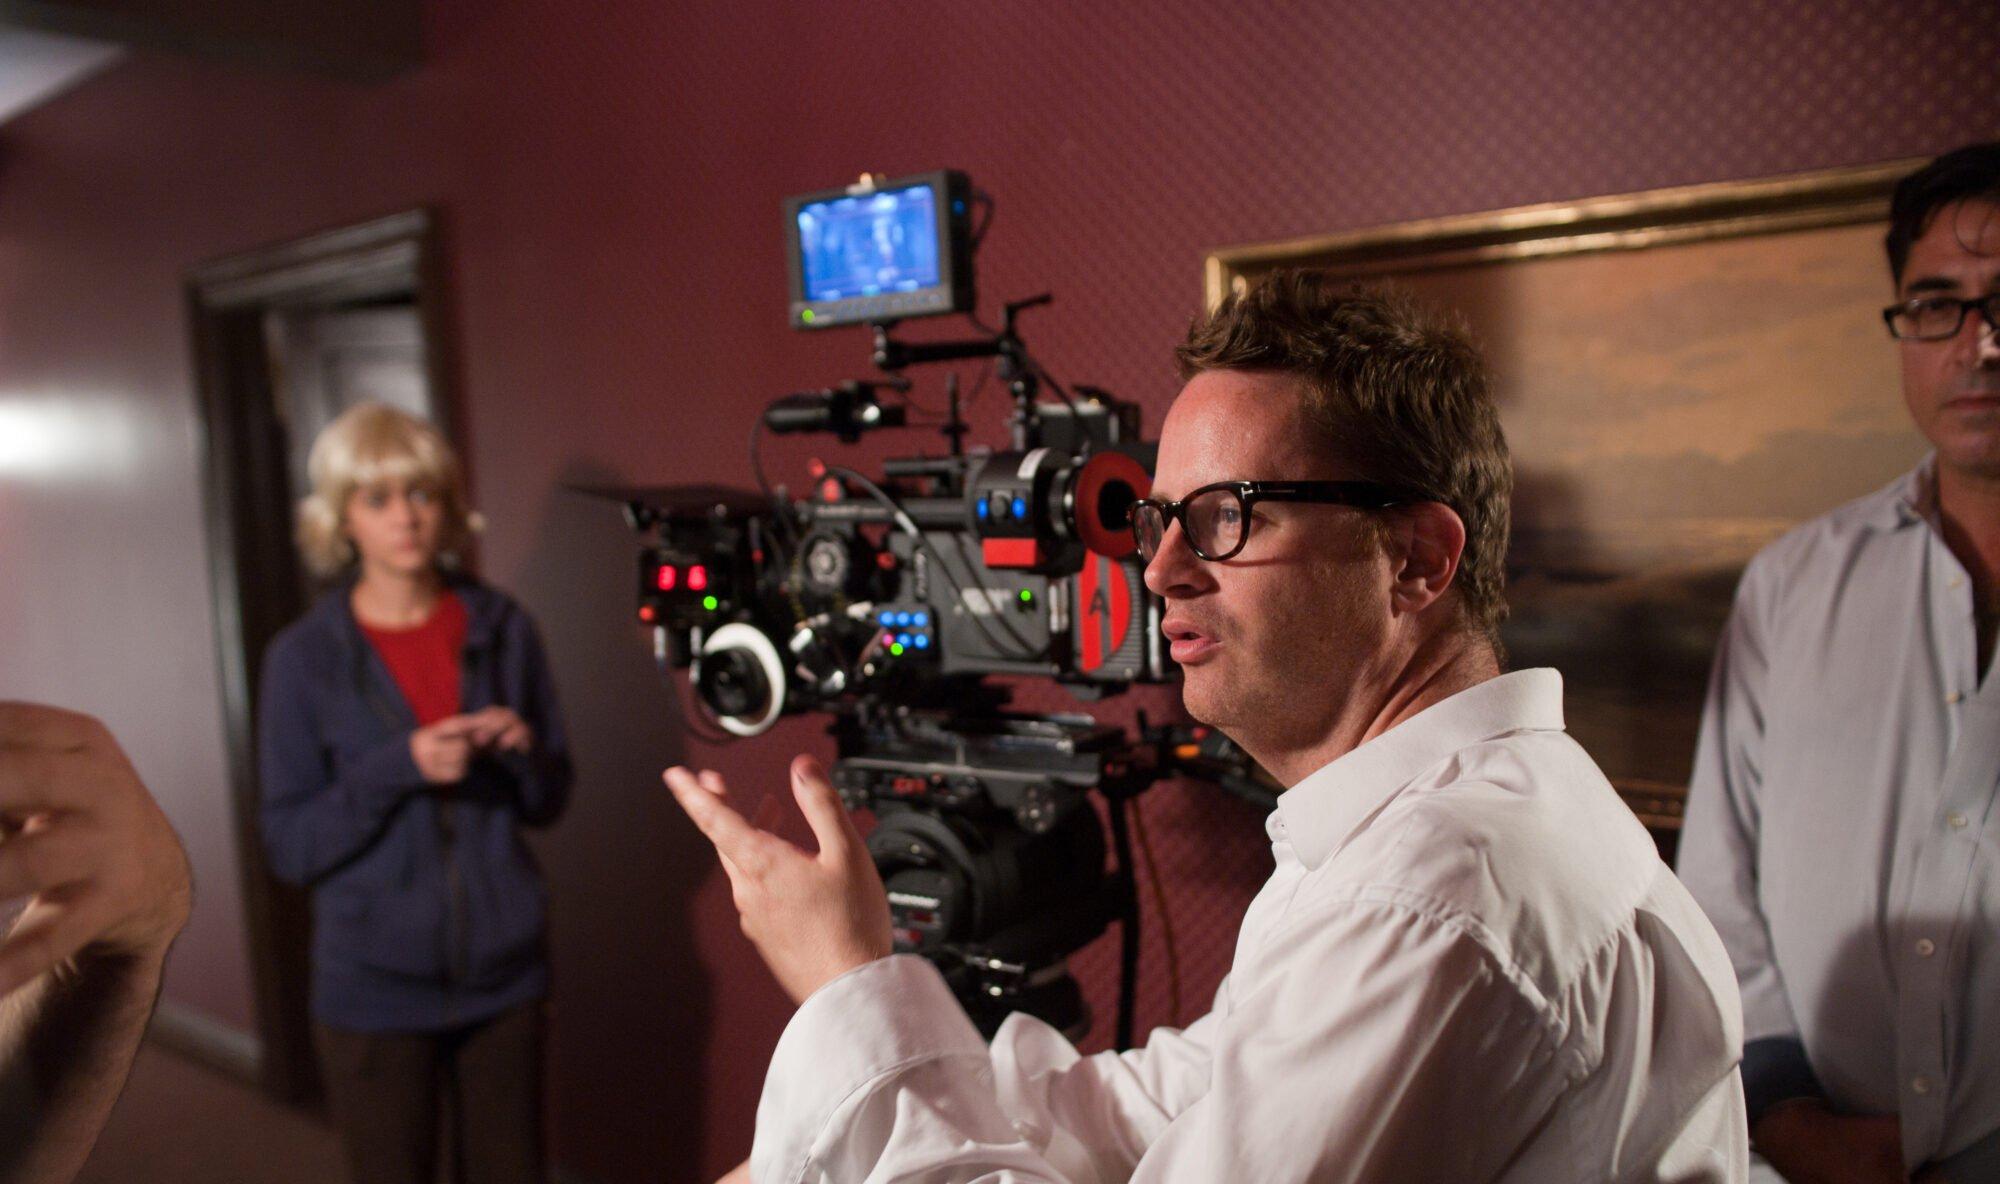 Interview: Nicolas Winding Refn Talks Drive, Ryan Gosling, and More